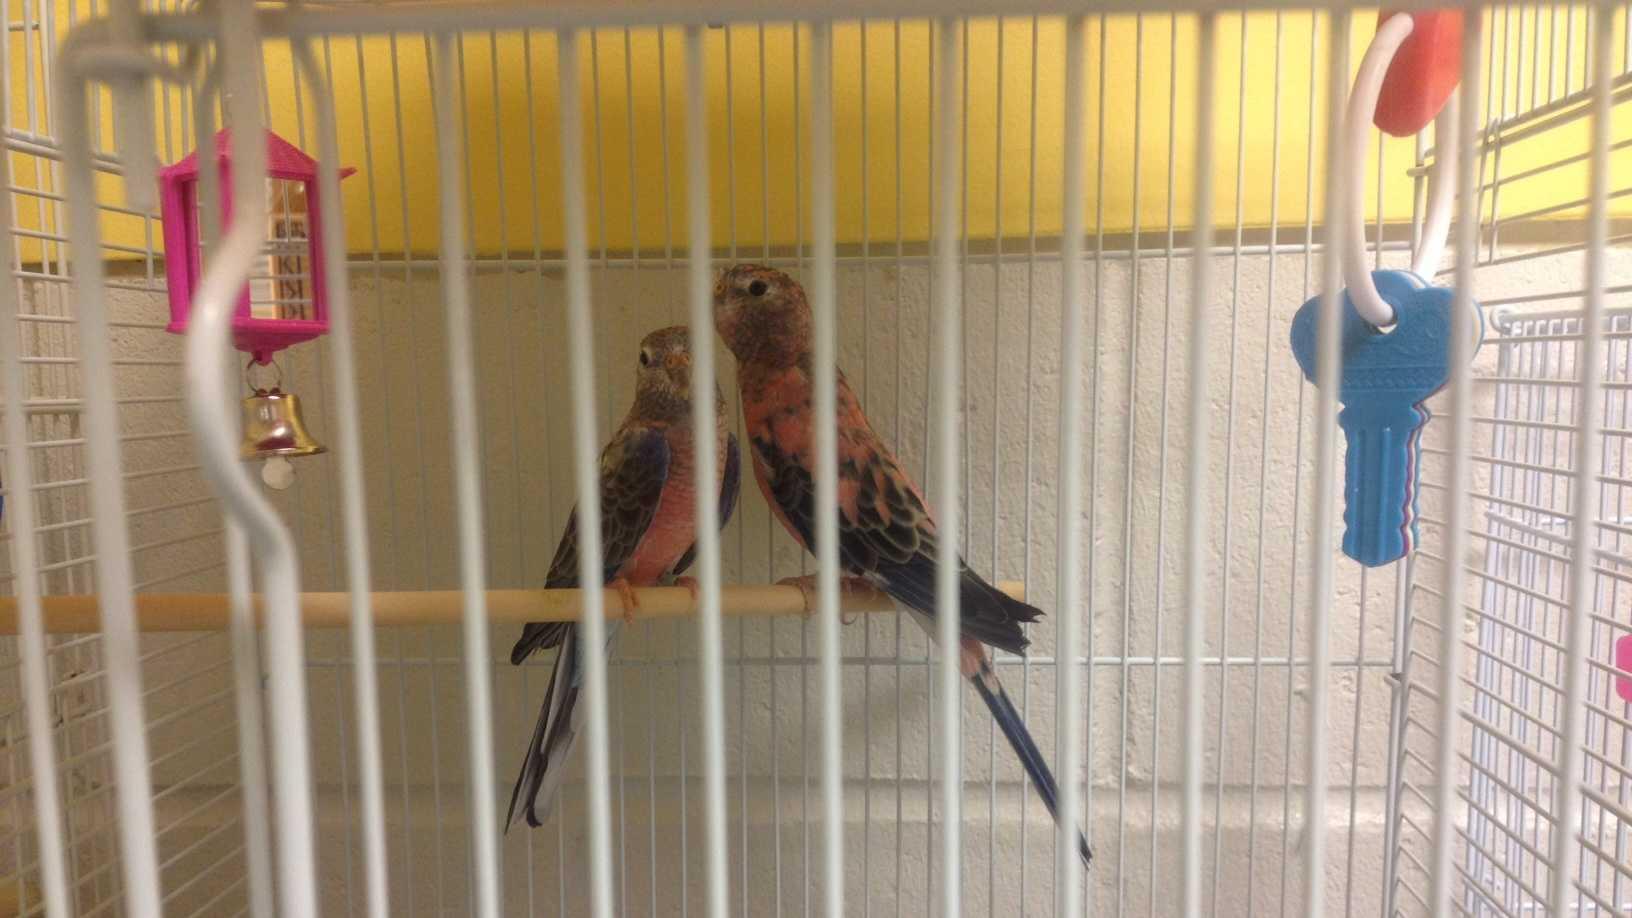 Bird cruelty